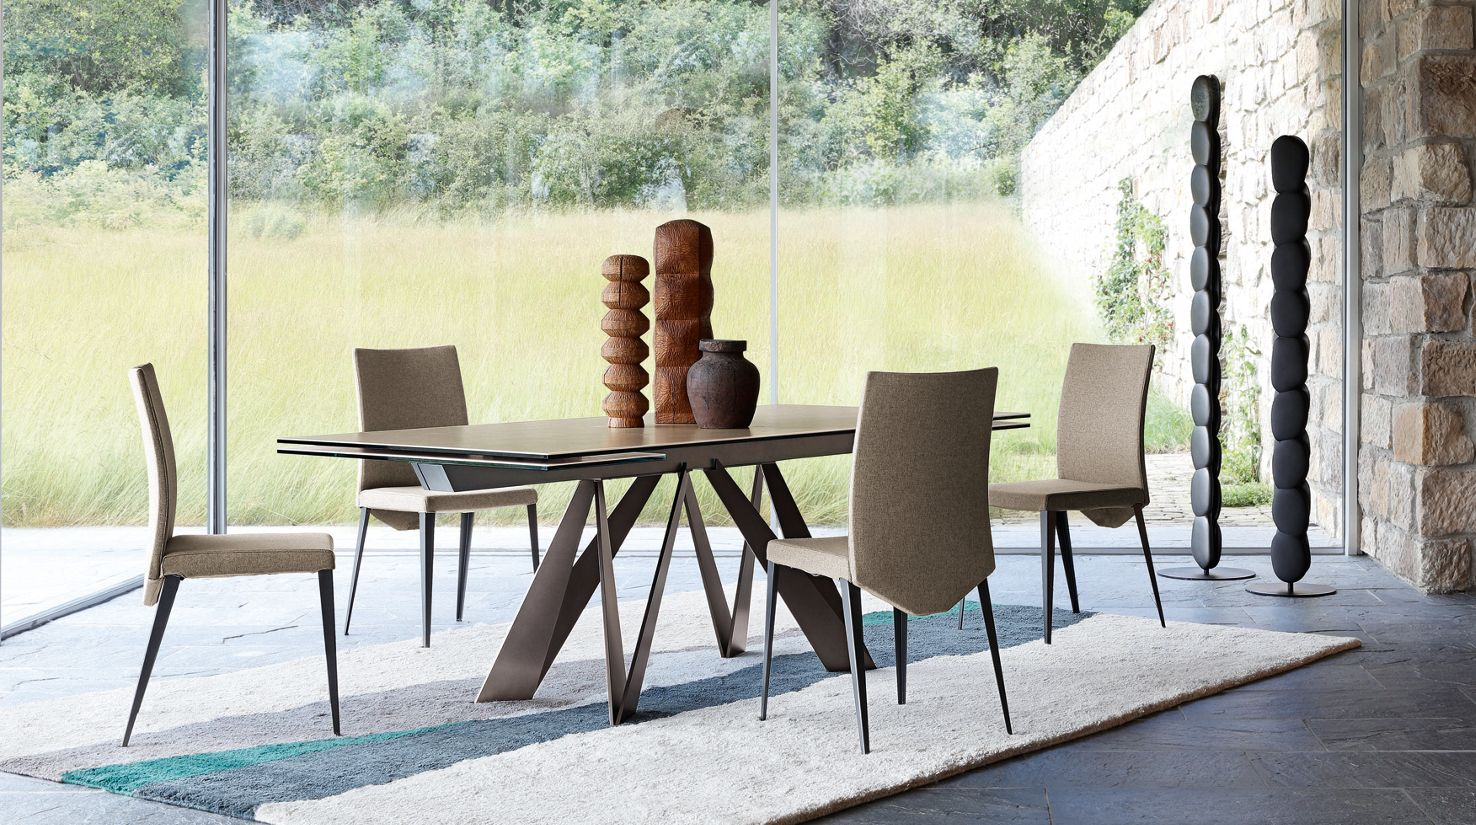 100 Génial Suggestions Roche Bobois Table Salle A Manger